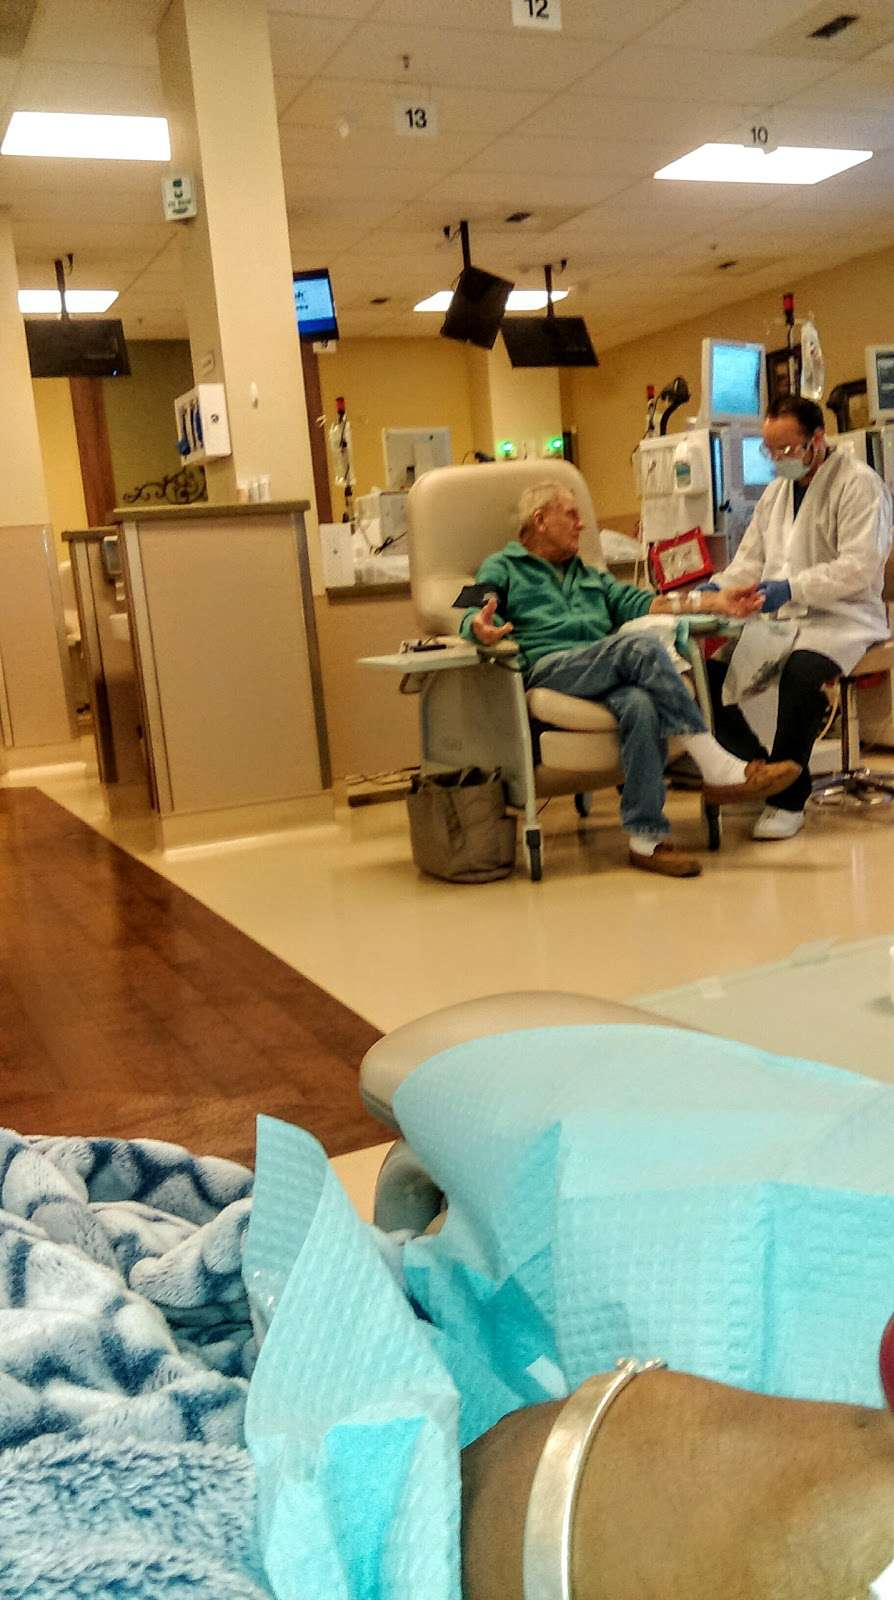 Satellite Healthcare Rohnert Park - health  | Photo 2 of 4 | Address: 6265 Commerce Blvd #156, Rohnert Park, CA 94928, USA | Phone: (707) 549-6967